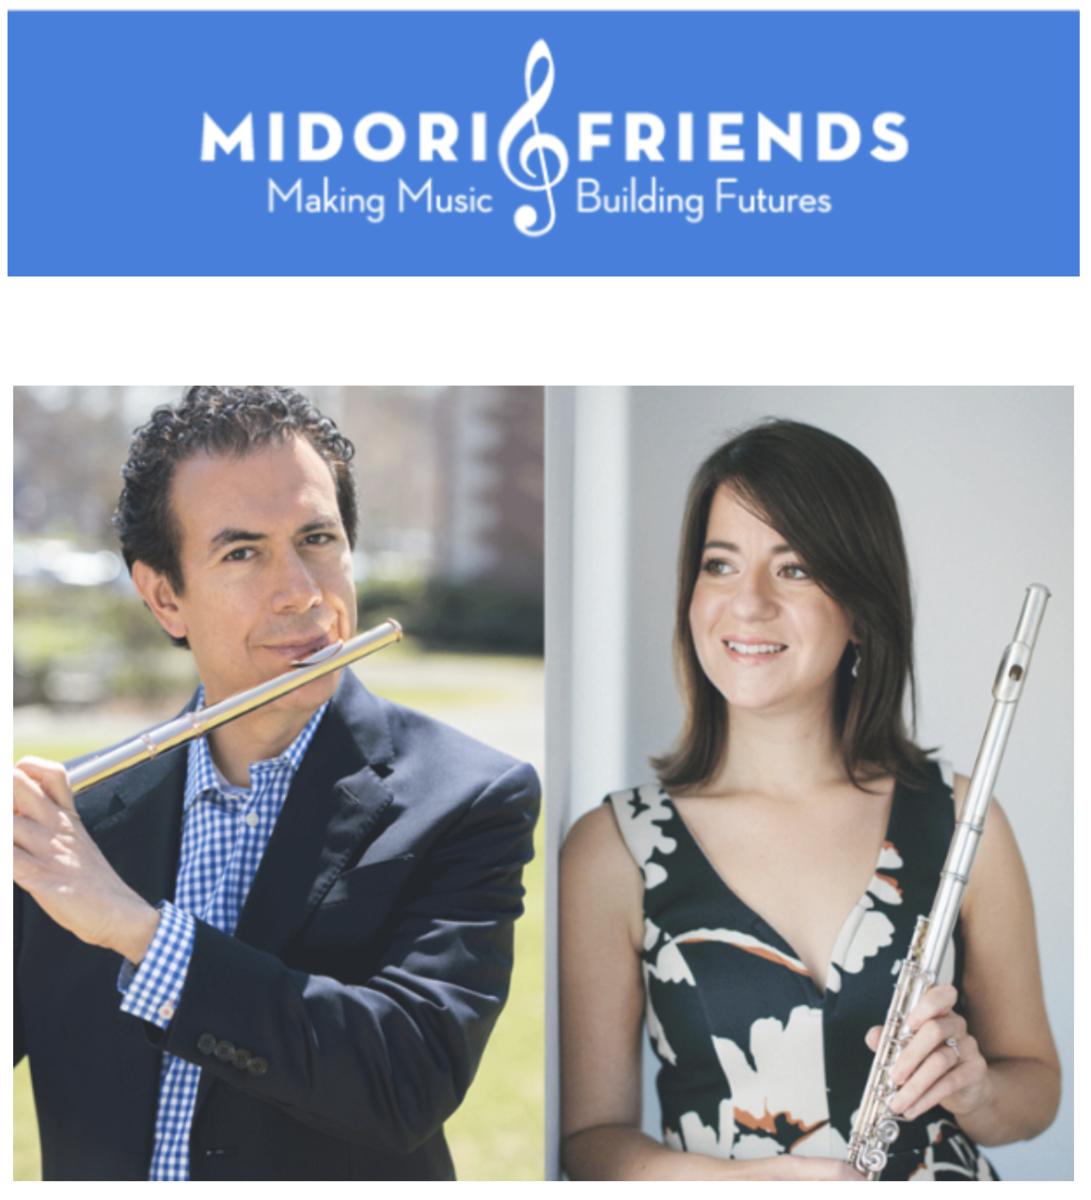 2 artists holding flutes